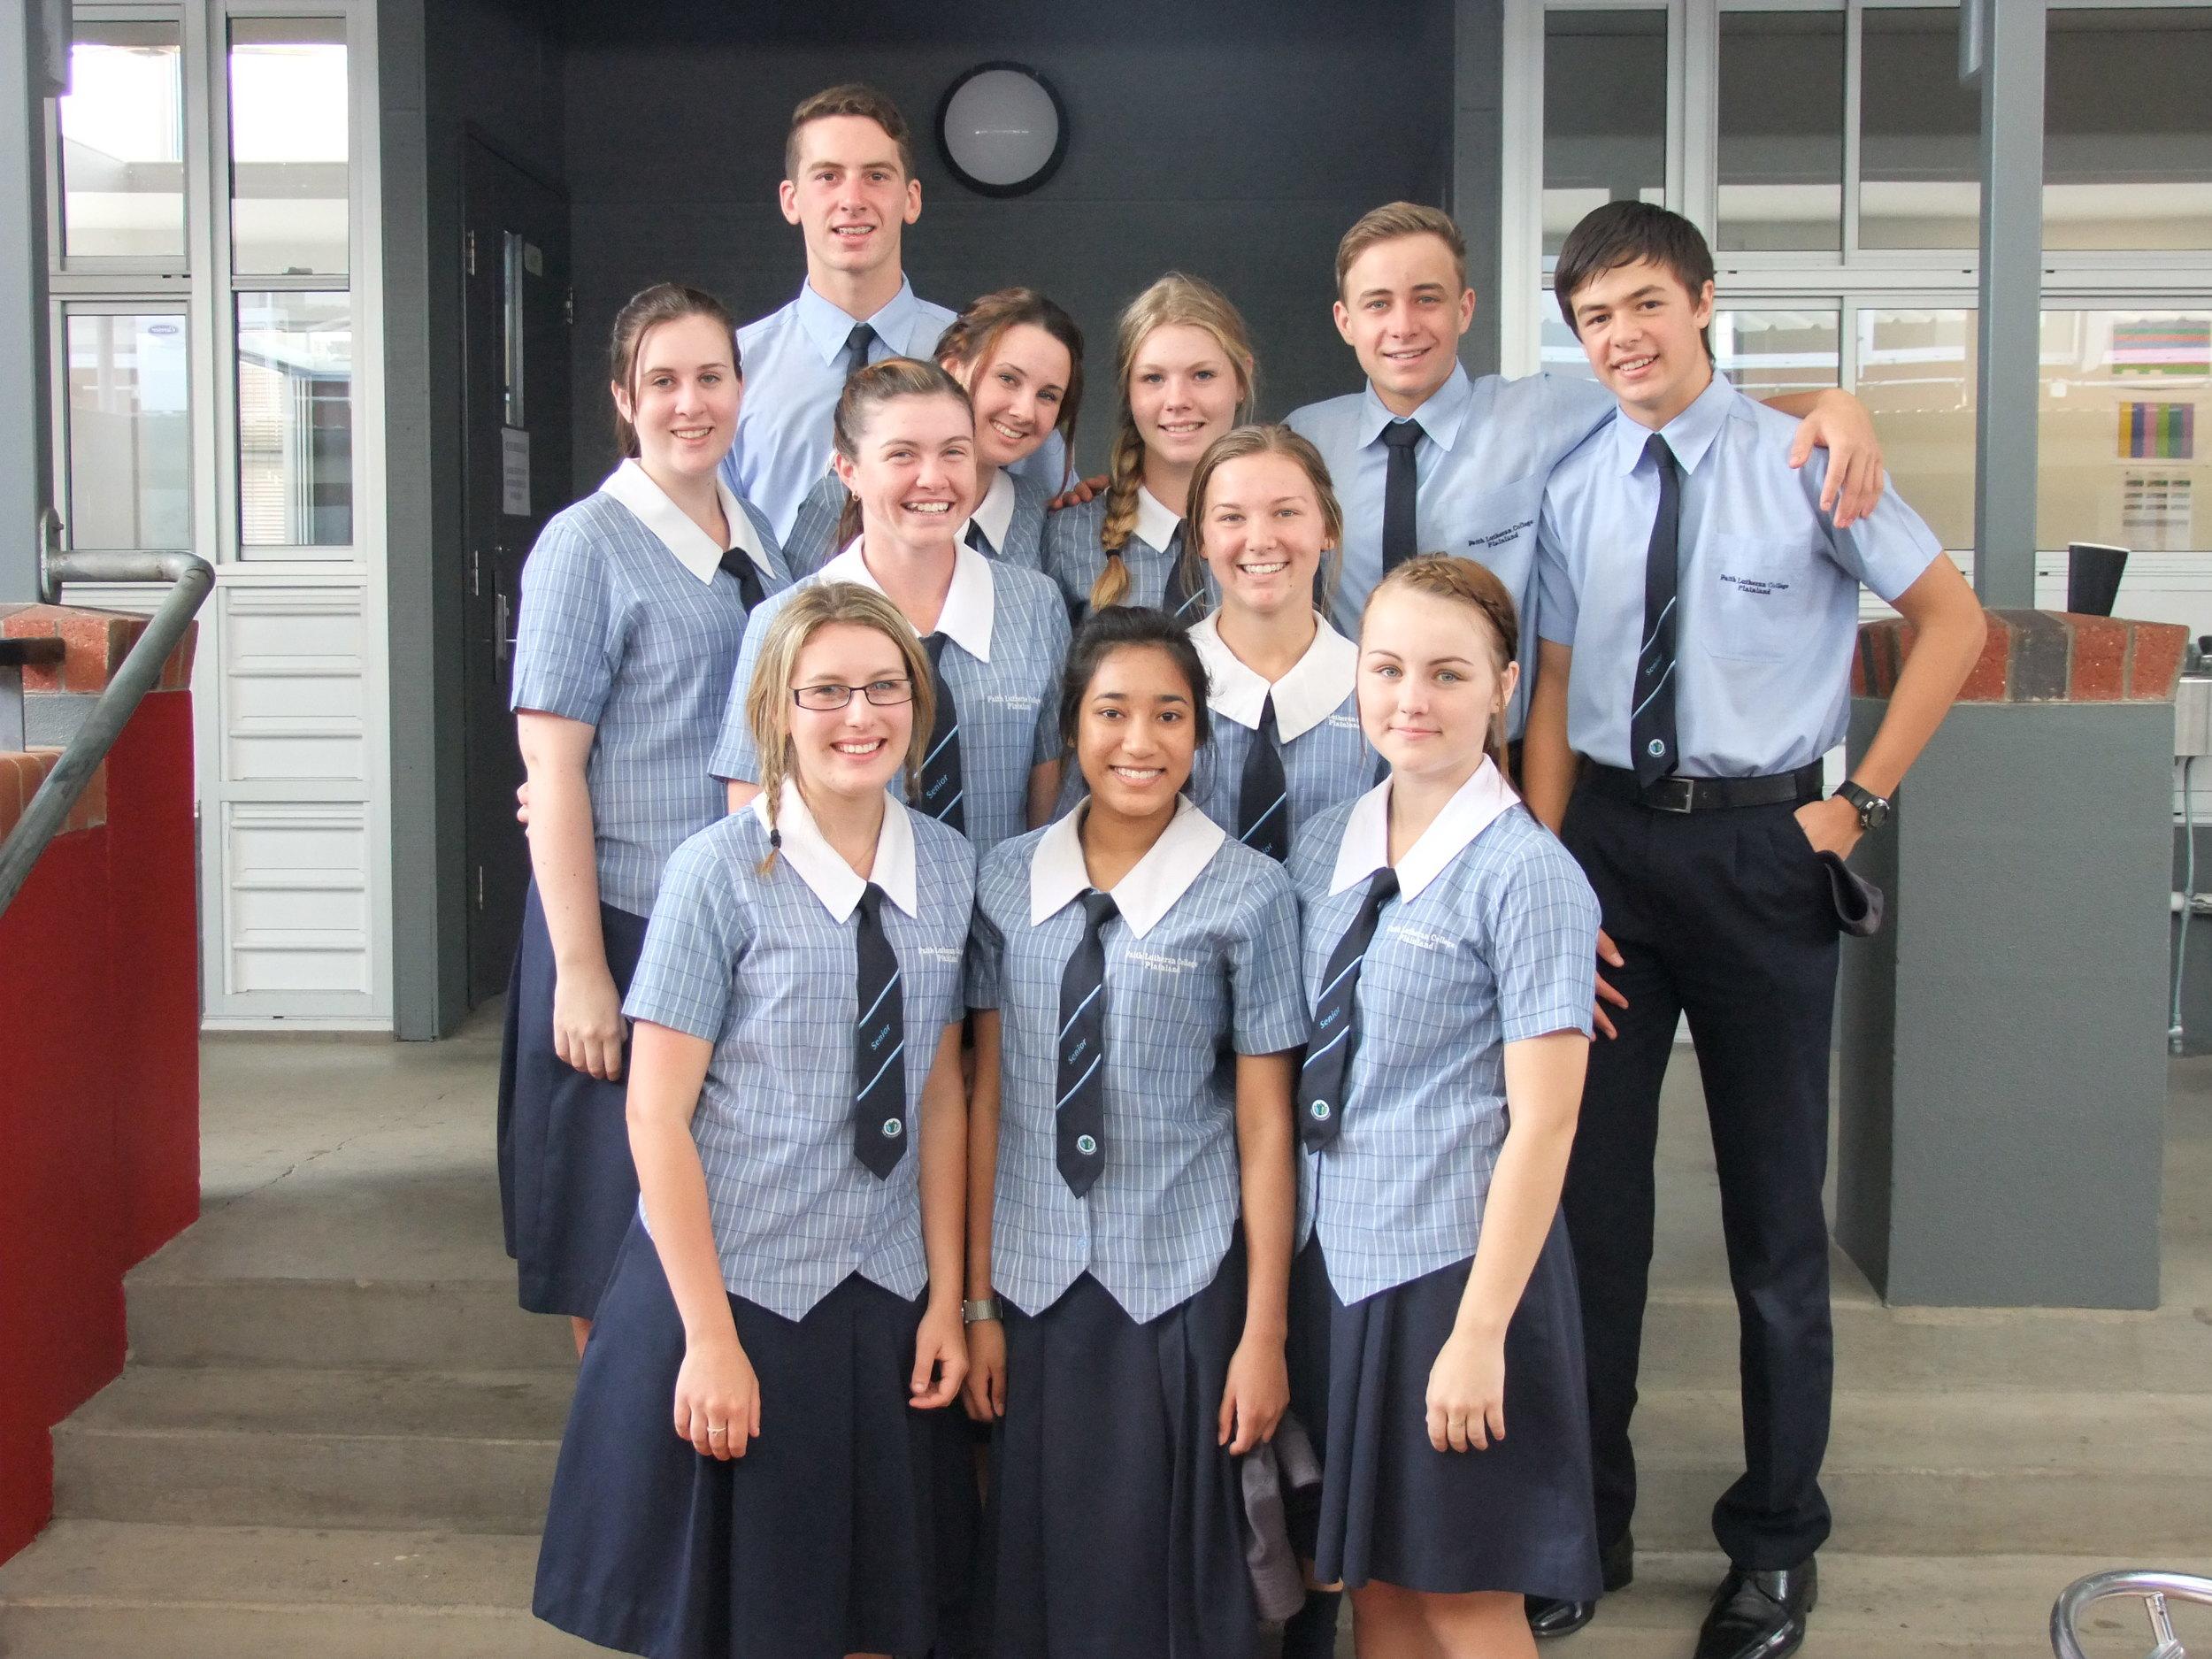 Our Year 12 Leadership Team